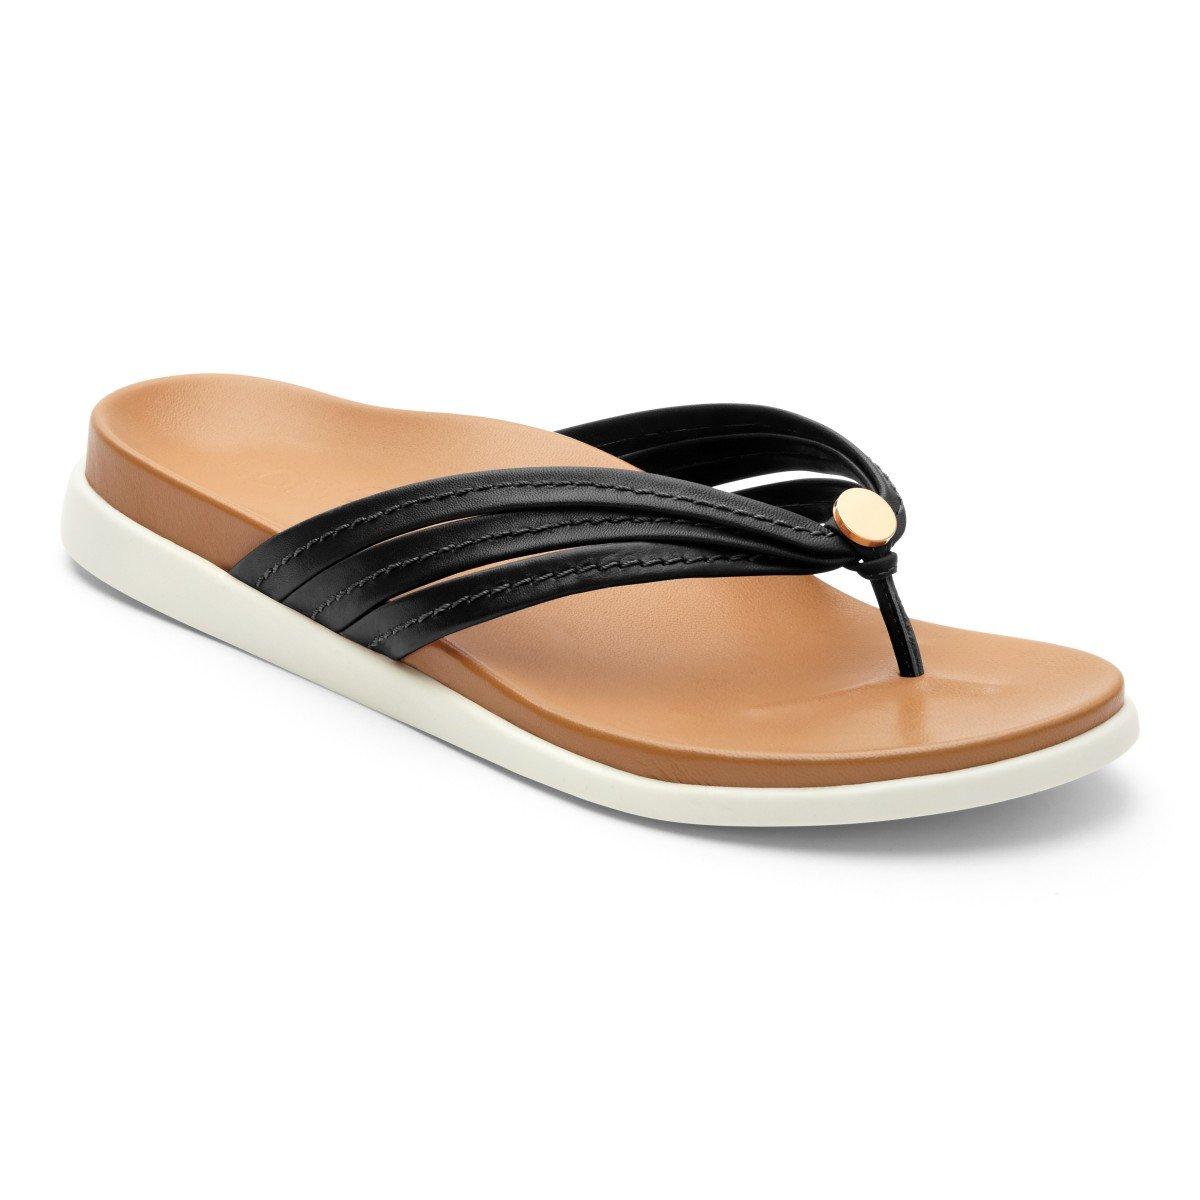 VIONIC Zehensteg Sandale Gr. Catalina schwarz Gr. Sandale 36-43 Schwarz 6cb87b